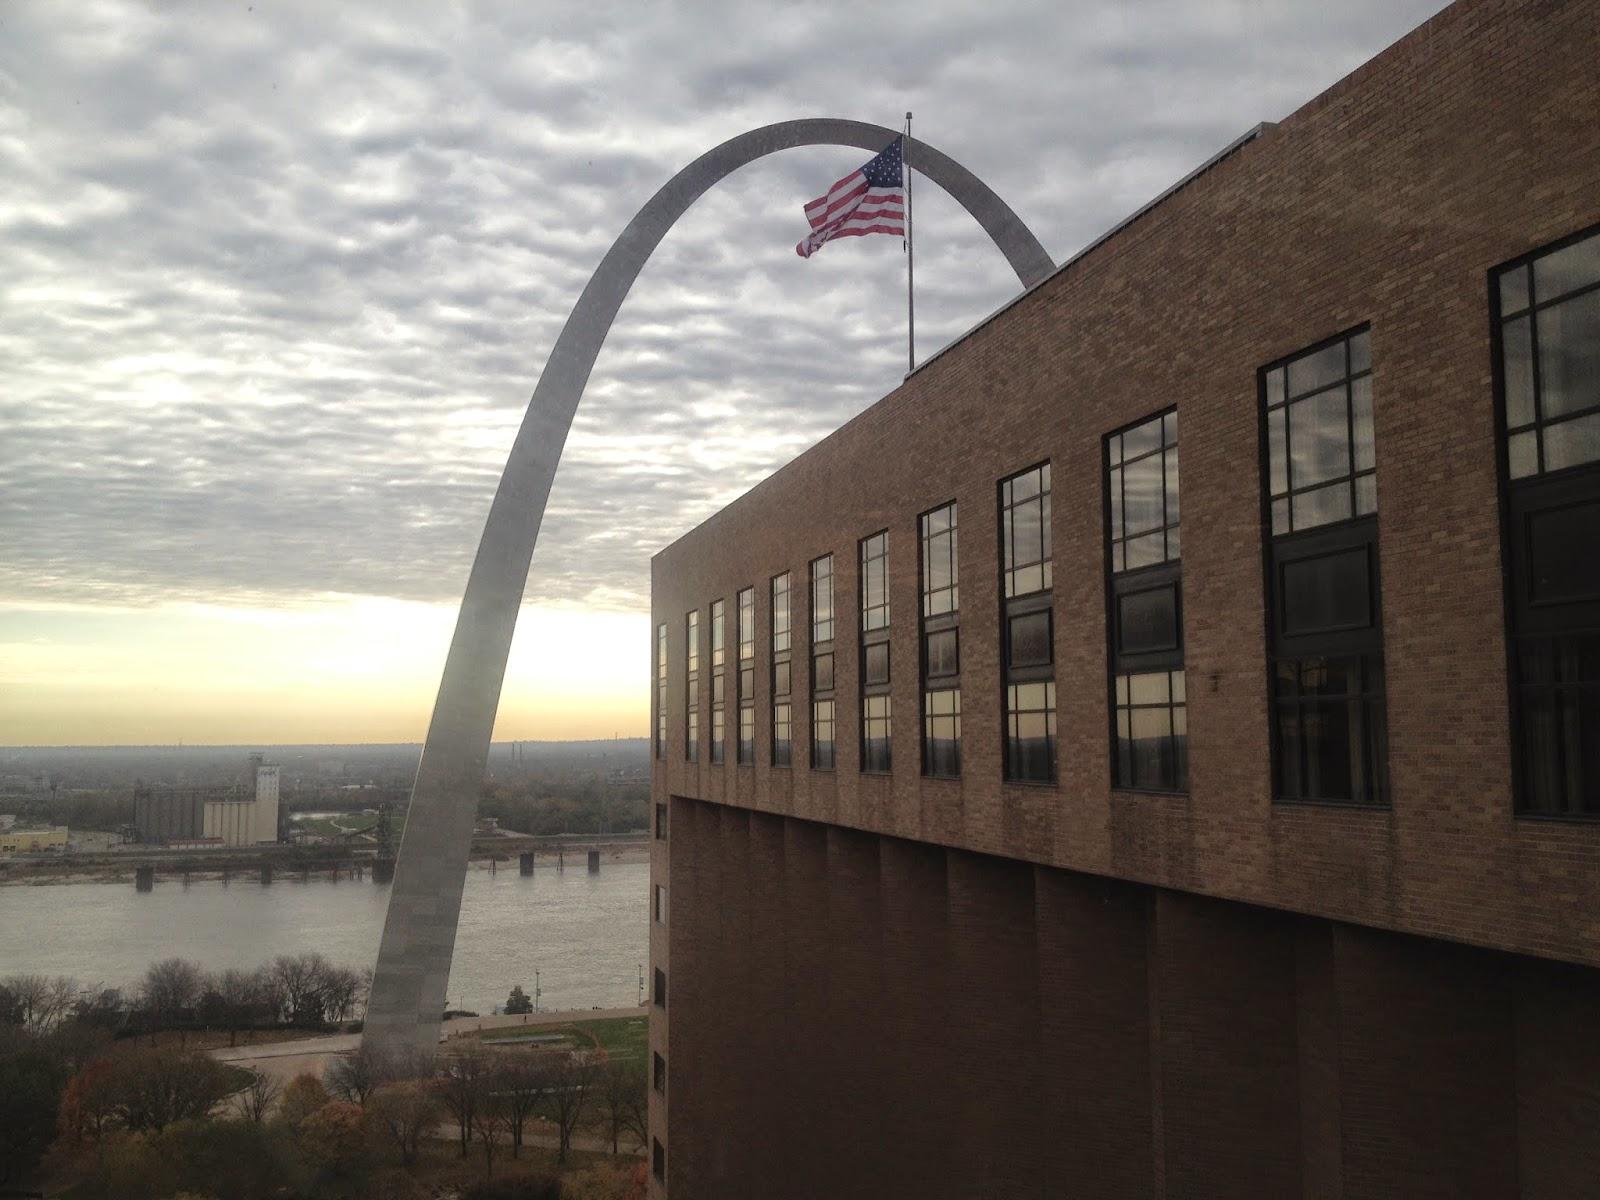 Aeron Desk Chair Folding Rental Columbus Ohio The Pointiff: Review: Hyatt Regency St. Louis At Arch